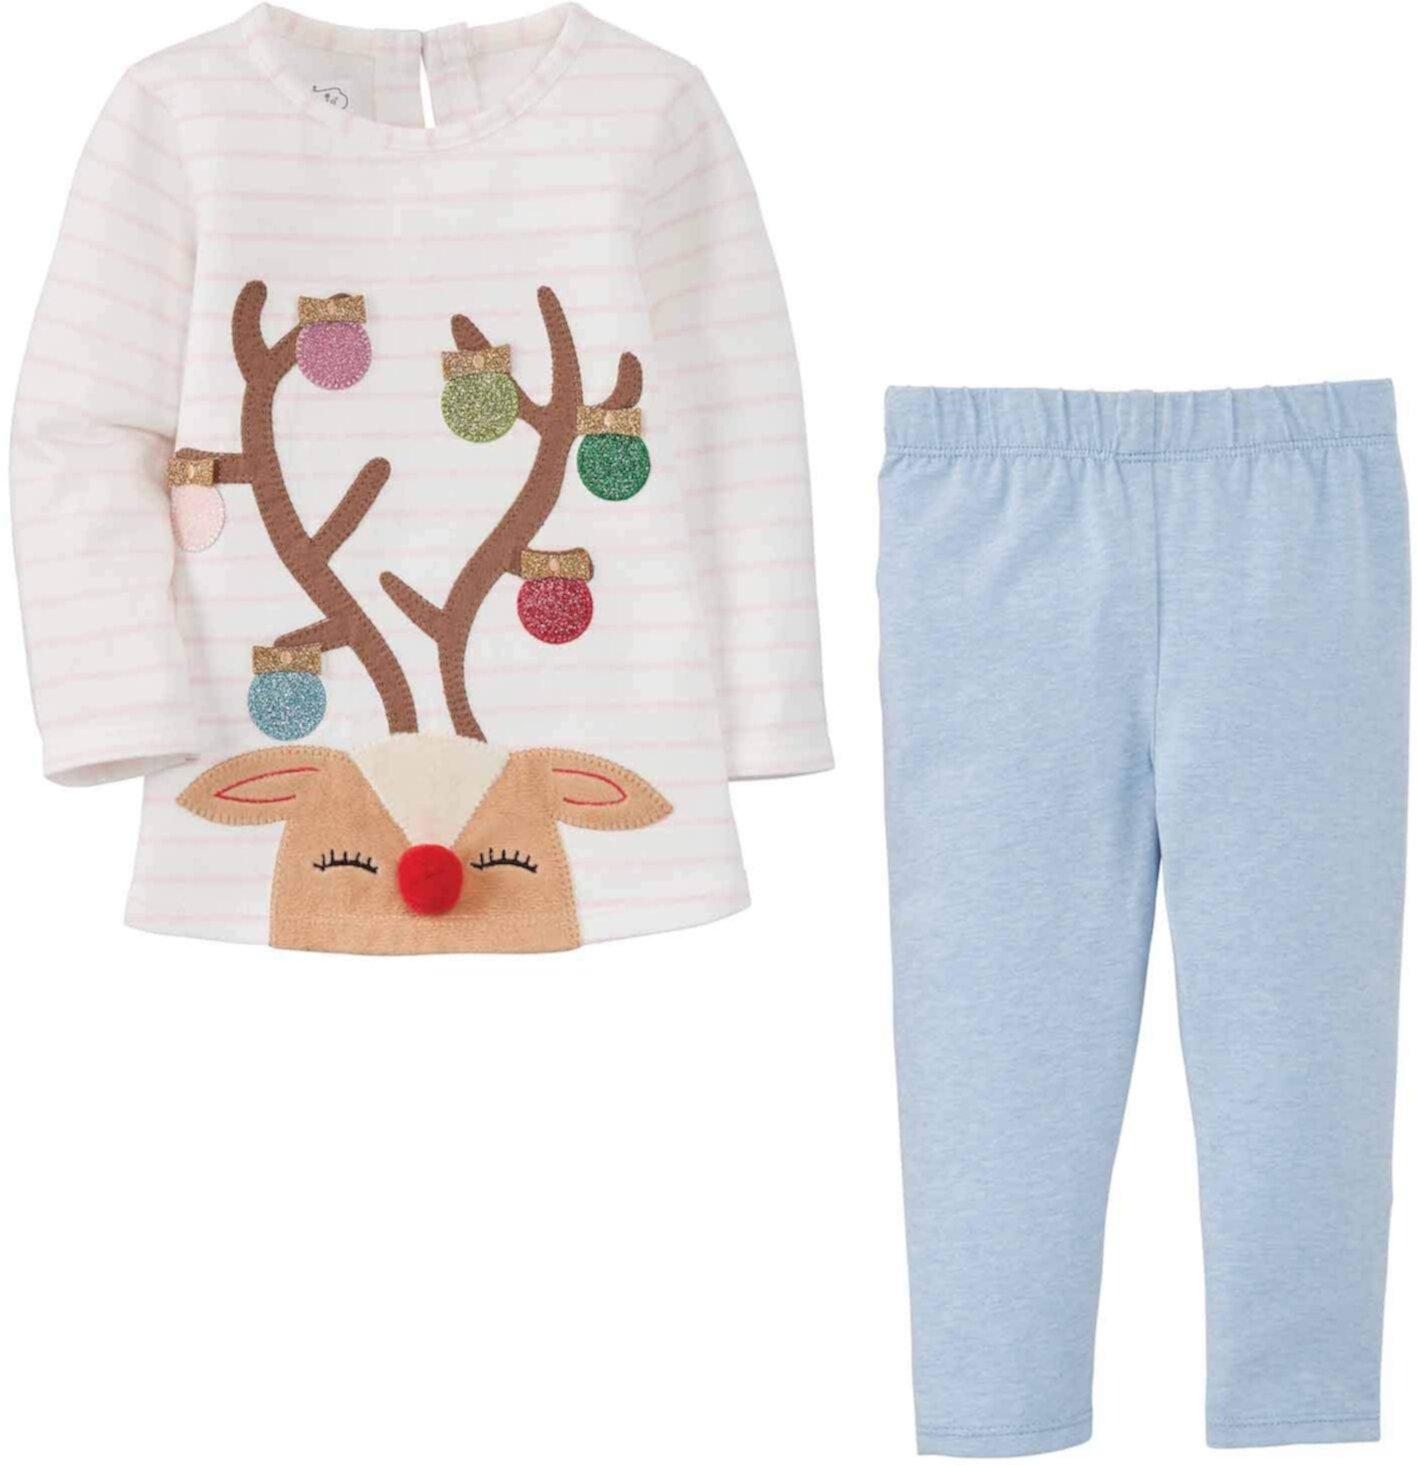 Reindeer Tunic and Legging Mud Pie